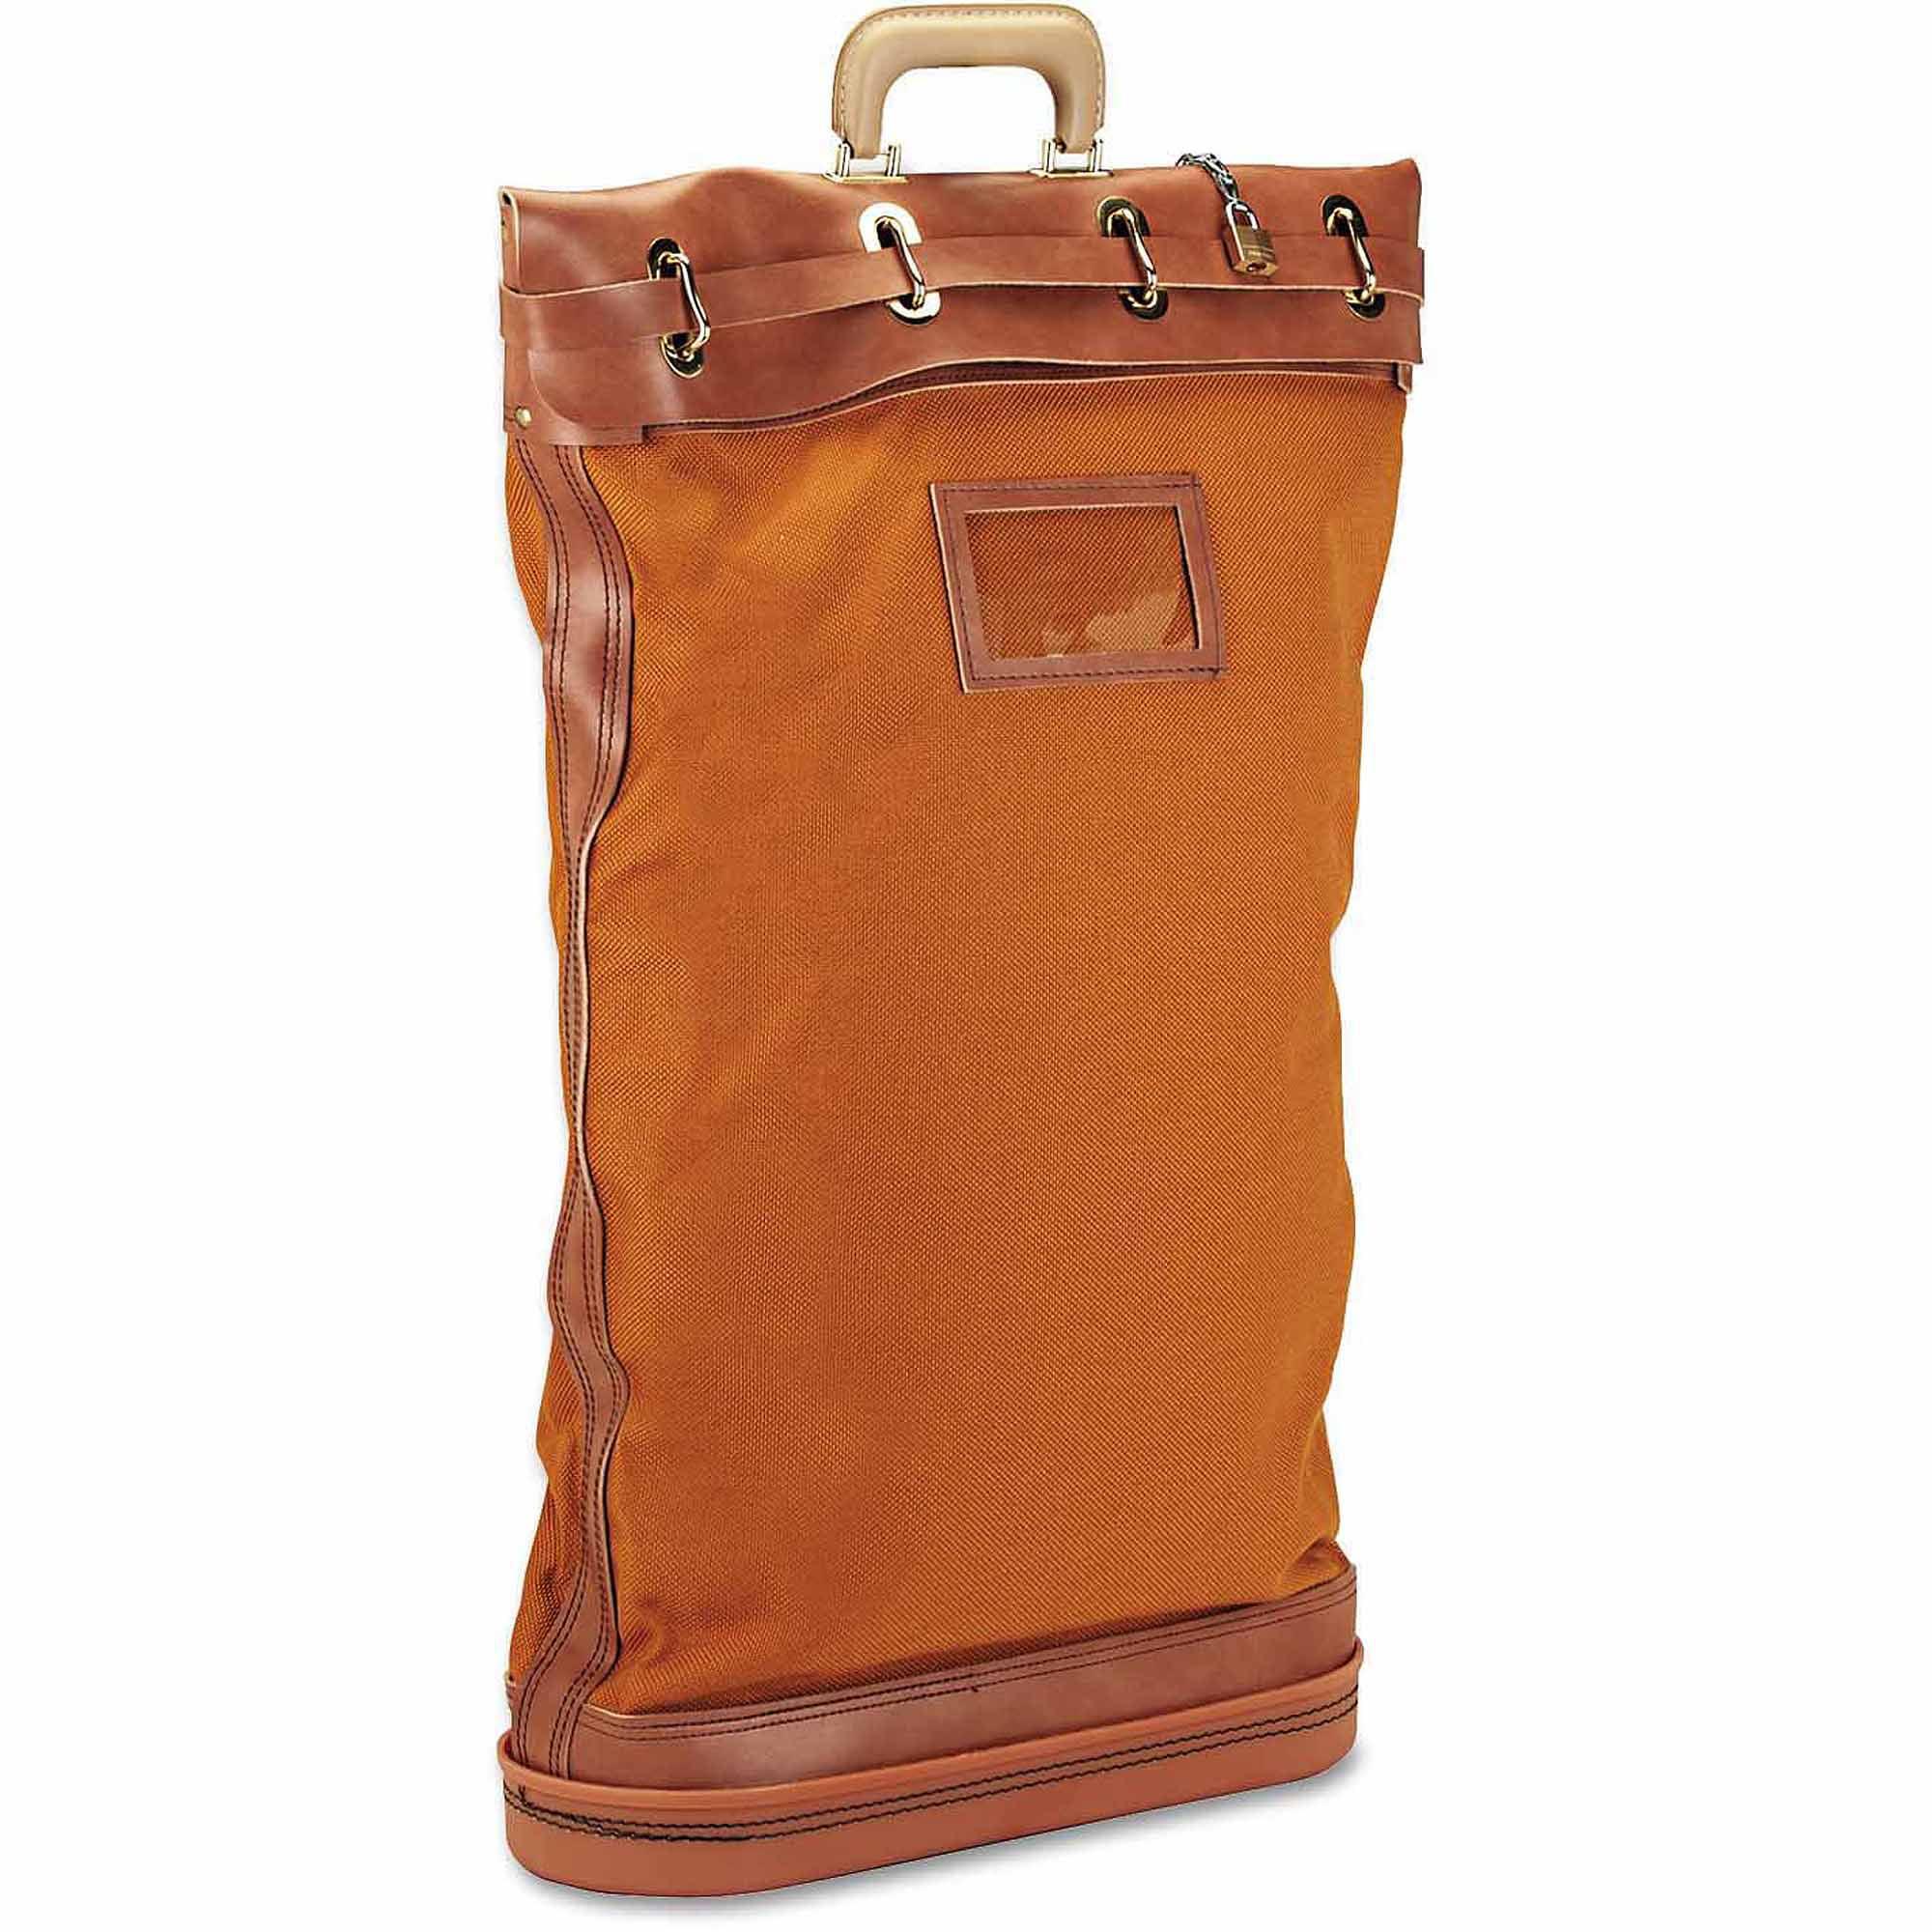 PM Company Security Mail Bag w/Lockable Belt Closure, 18w x 30h